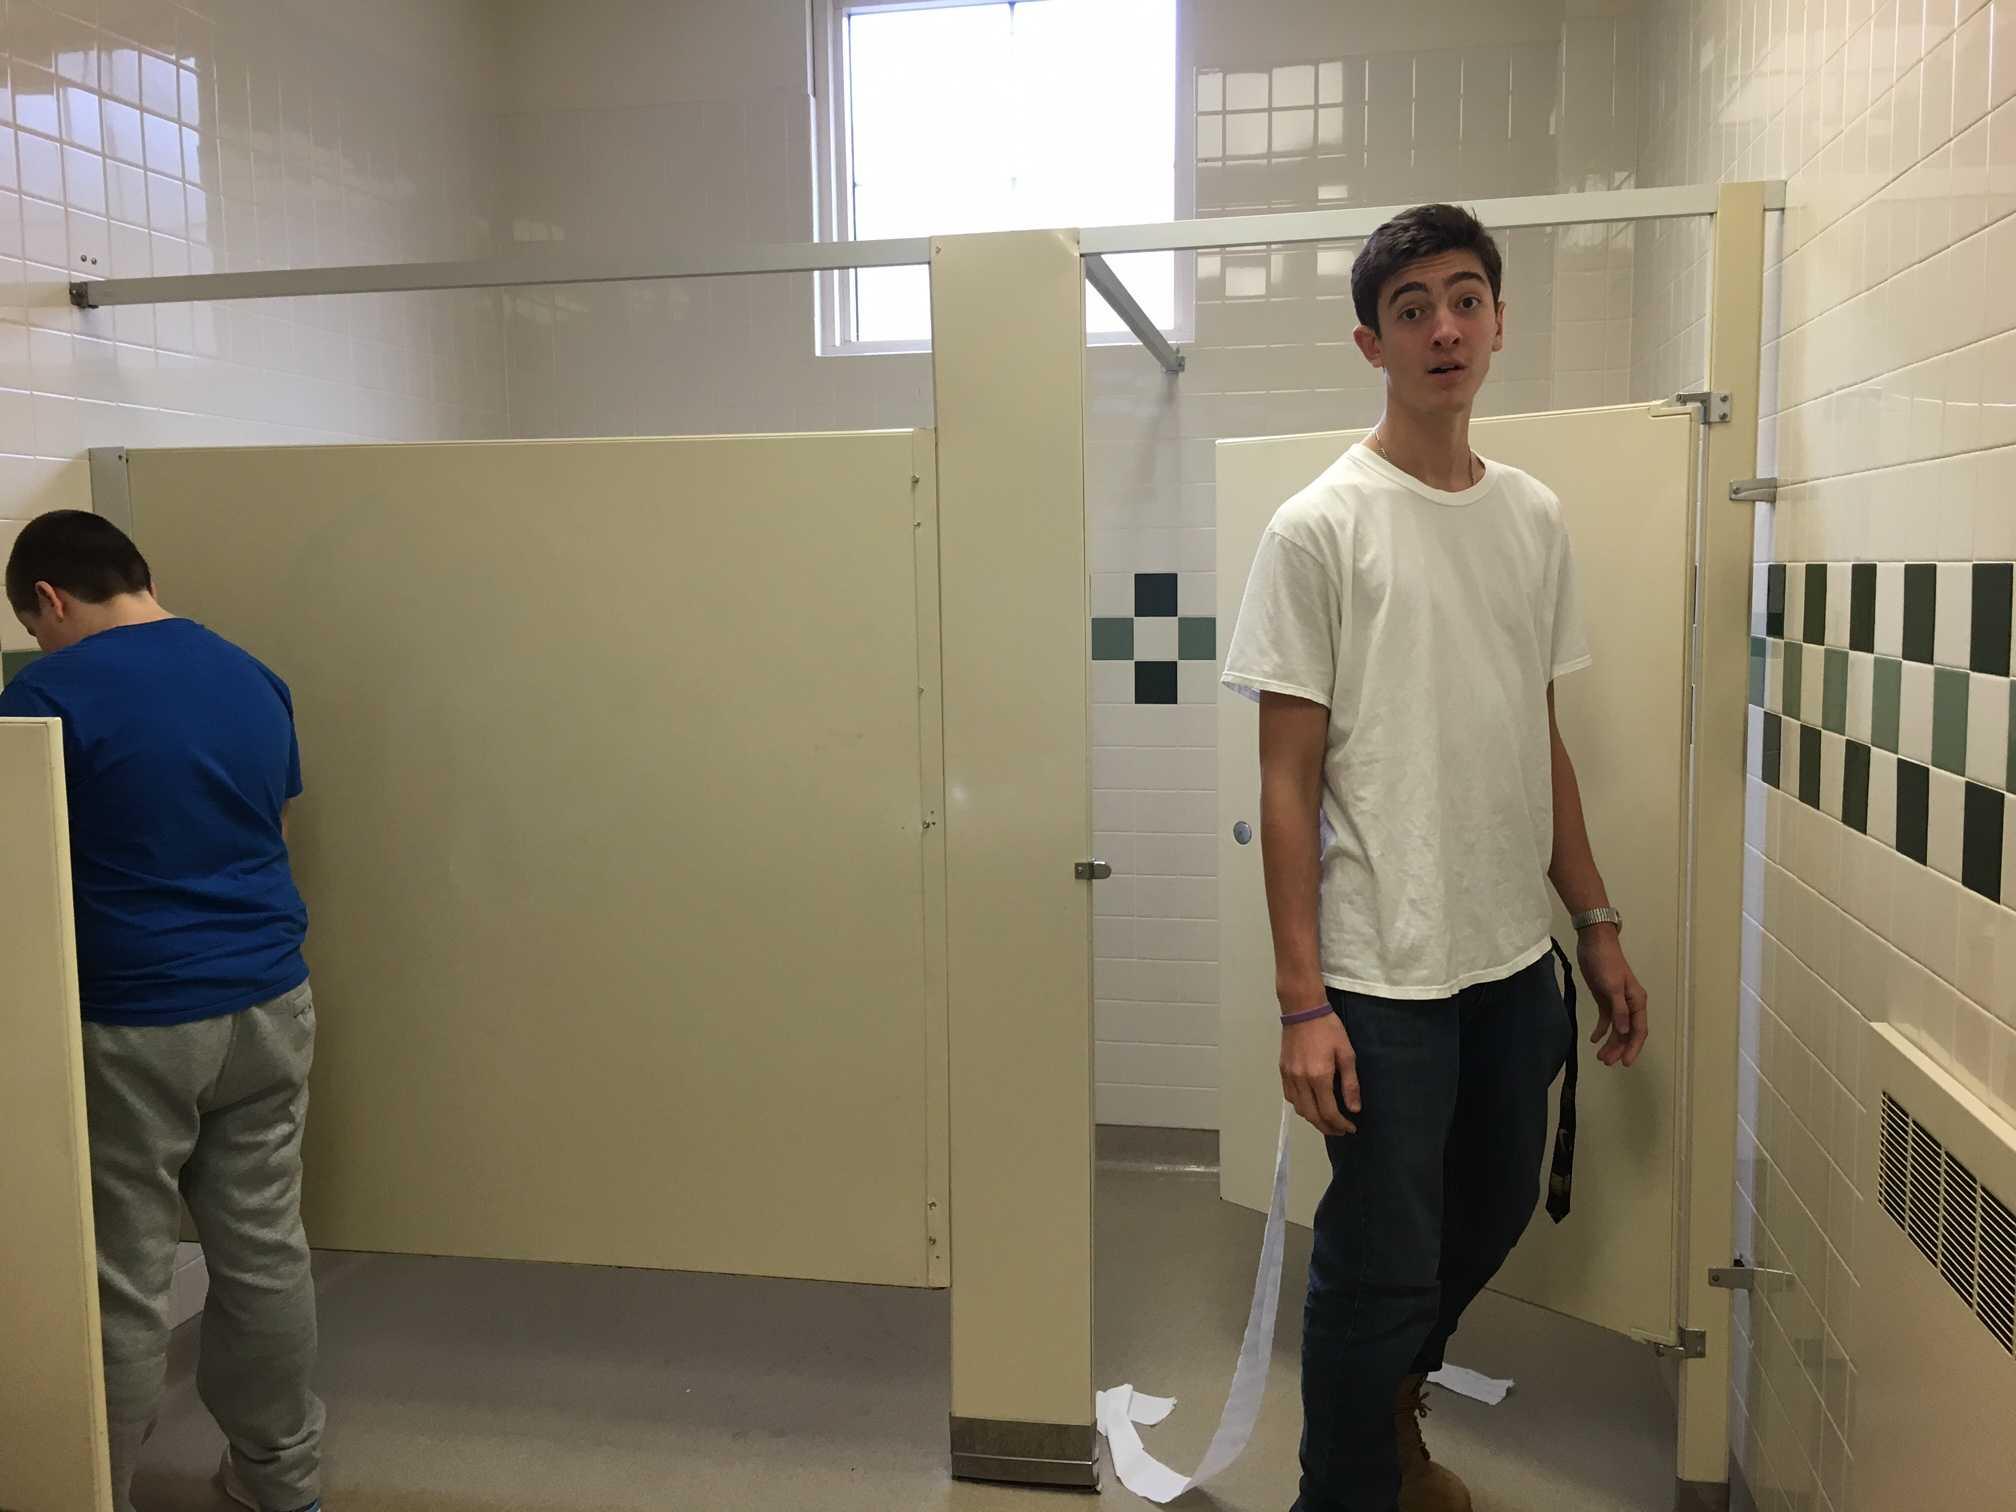 Is Using the Bathroom a Privilege? - Tiger Transcript